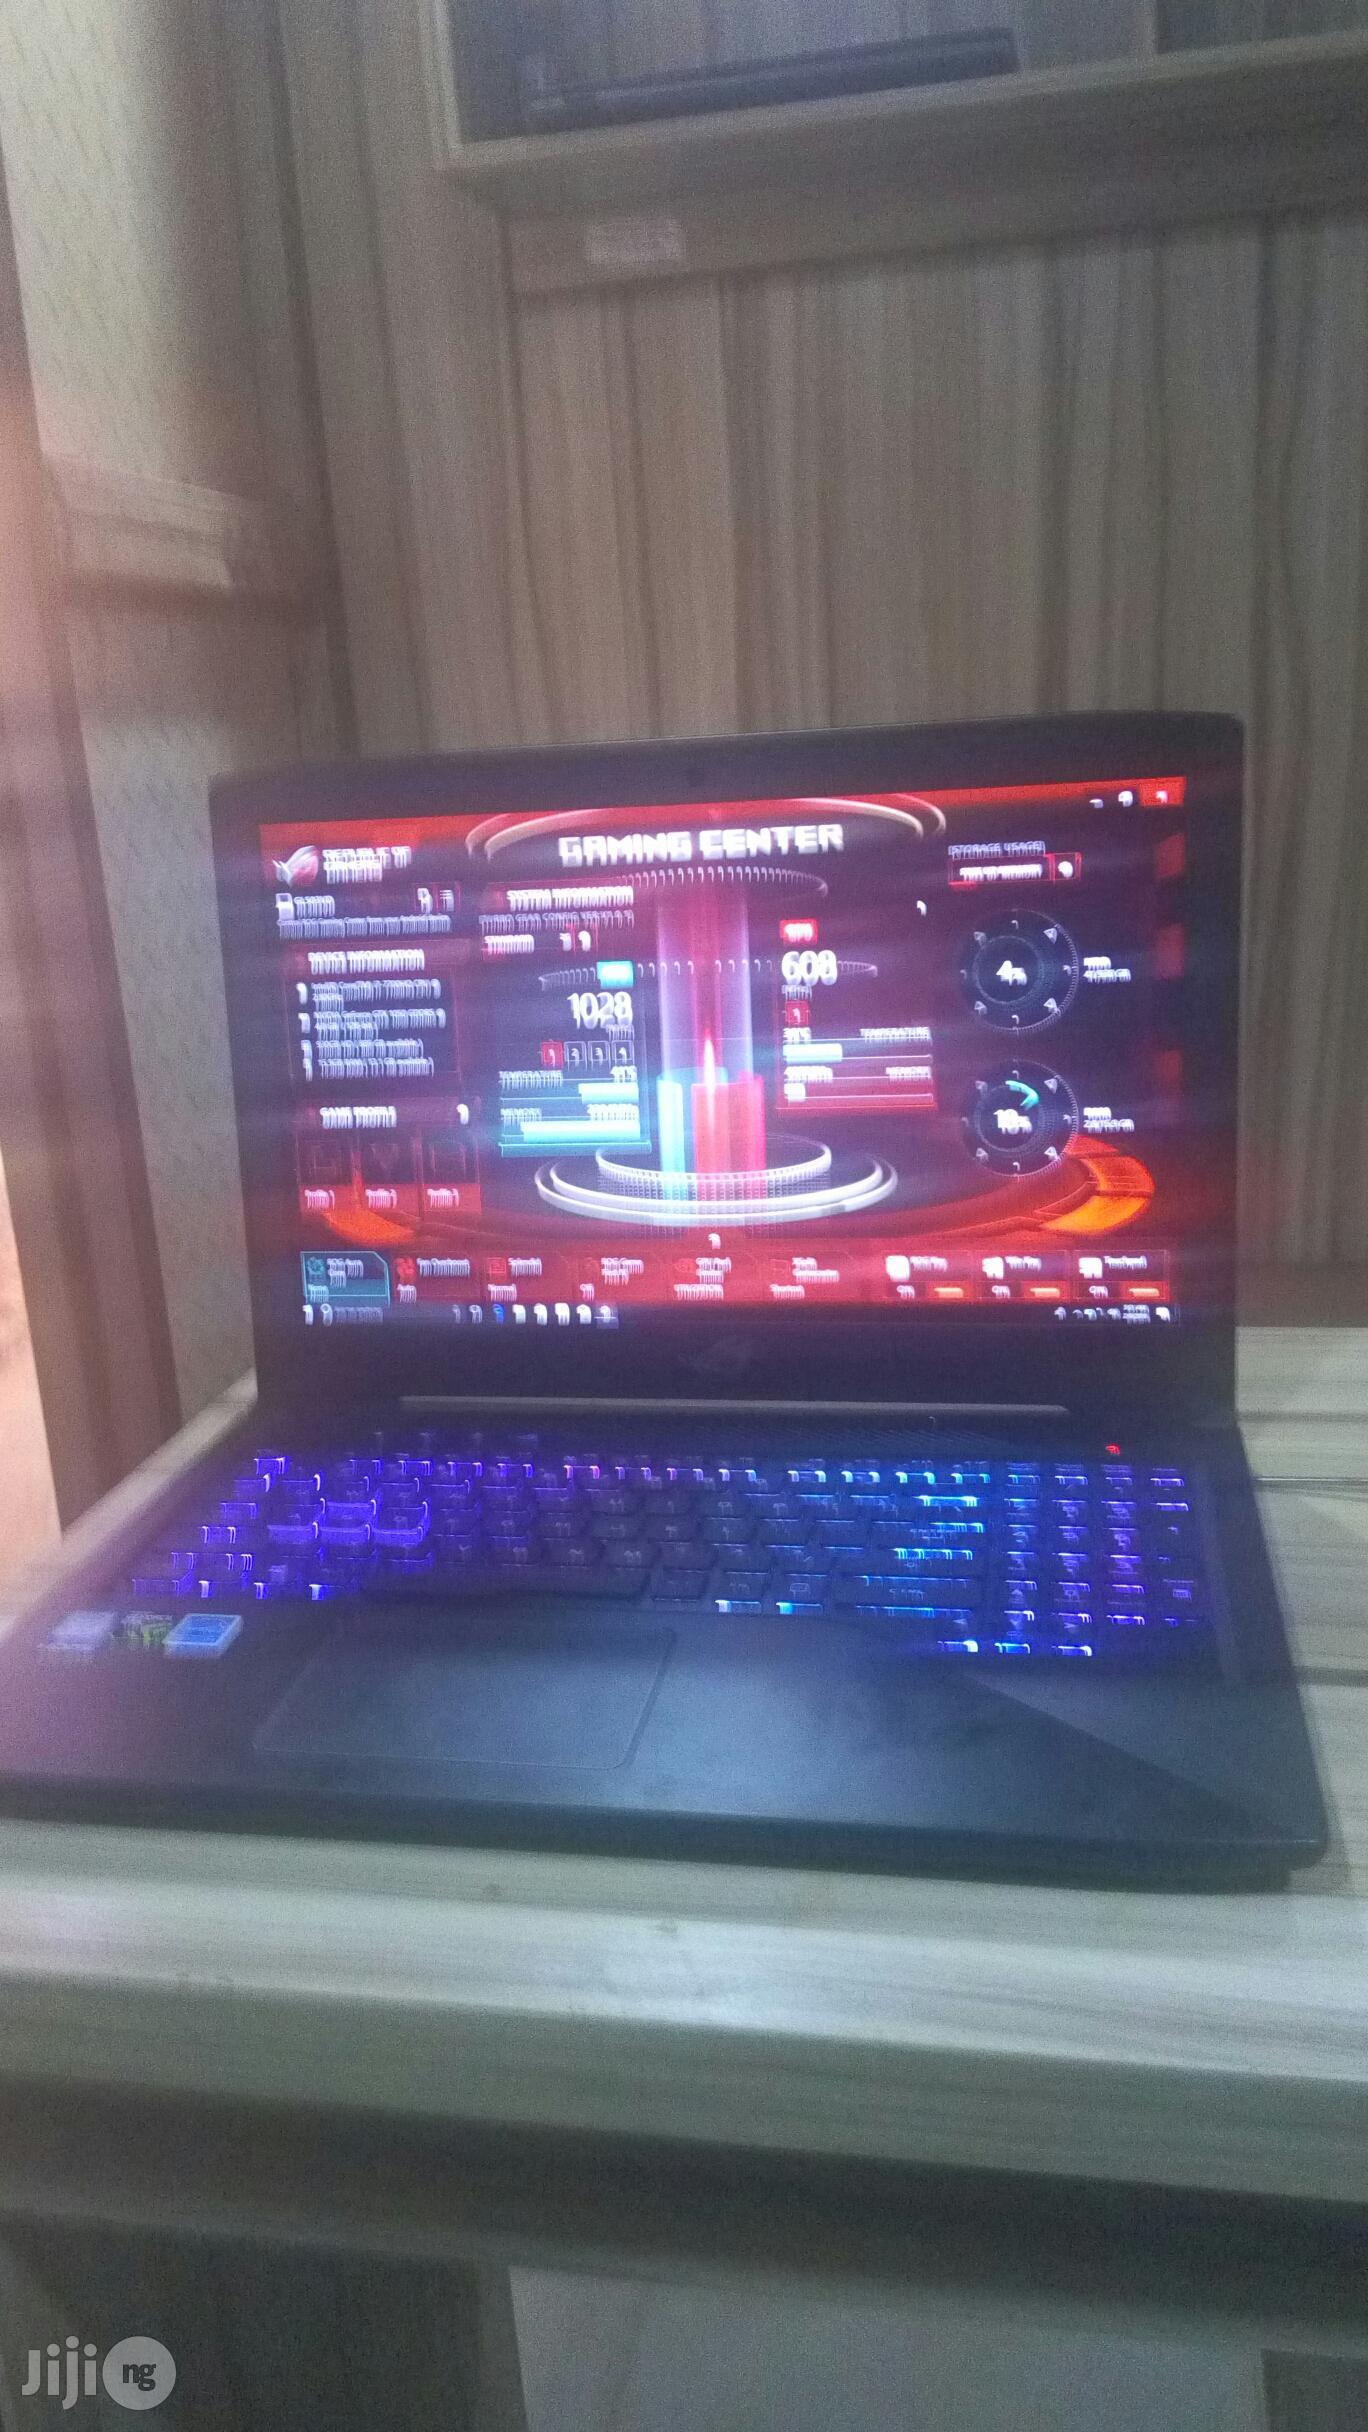 Laptop Asus ROG Strix GL503 16GB Intel Core I7 HDD 1T